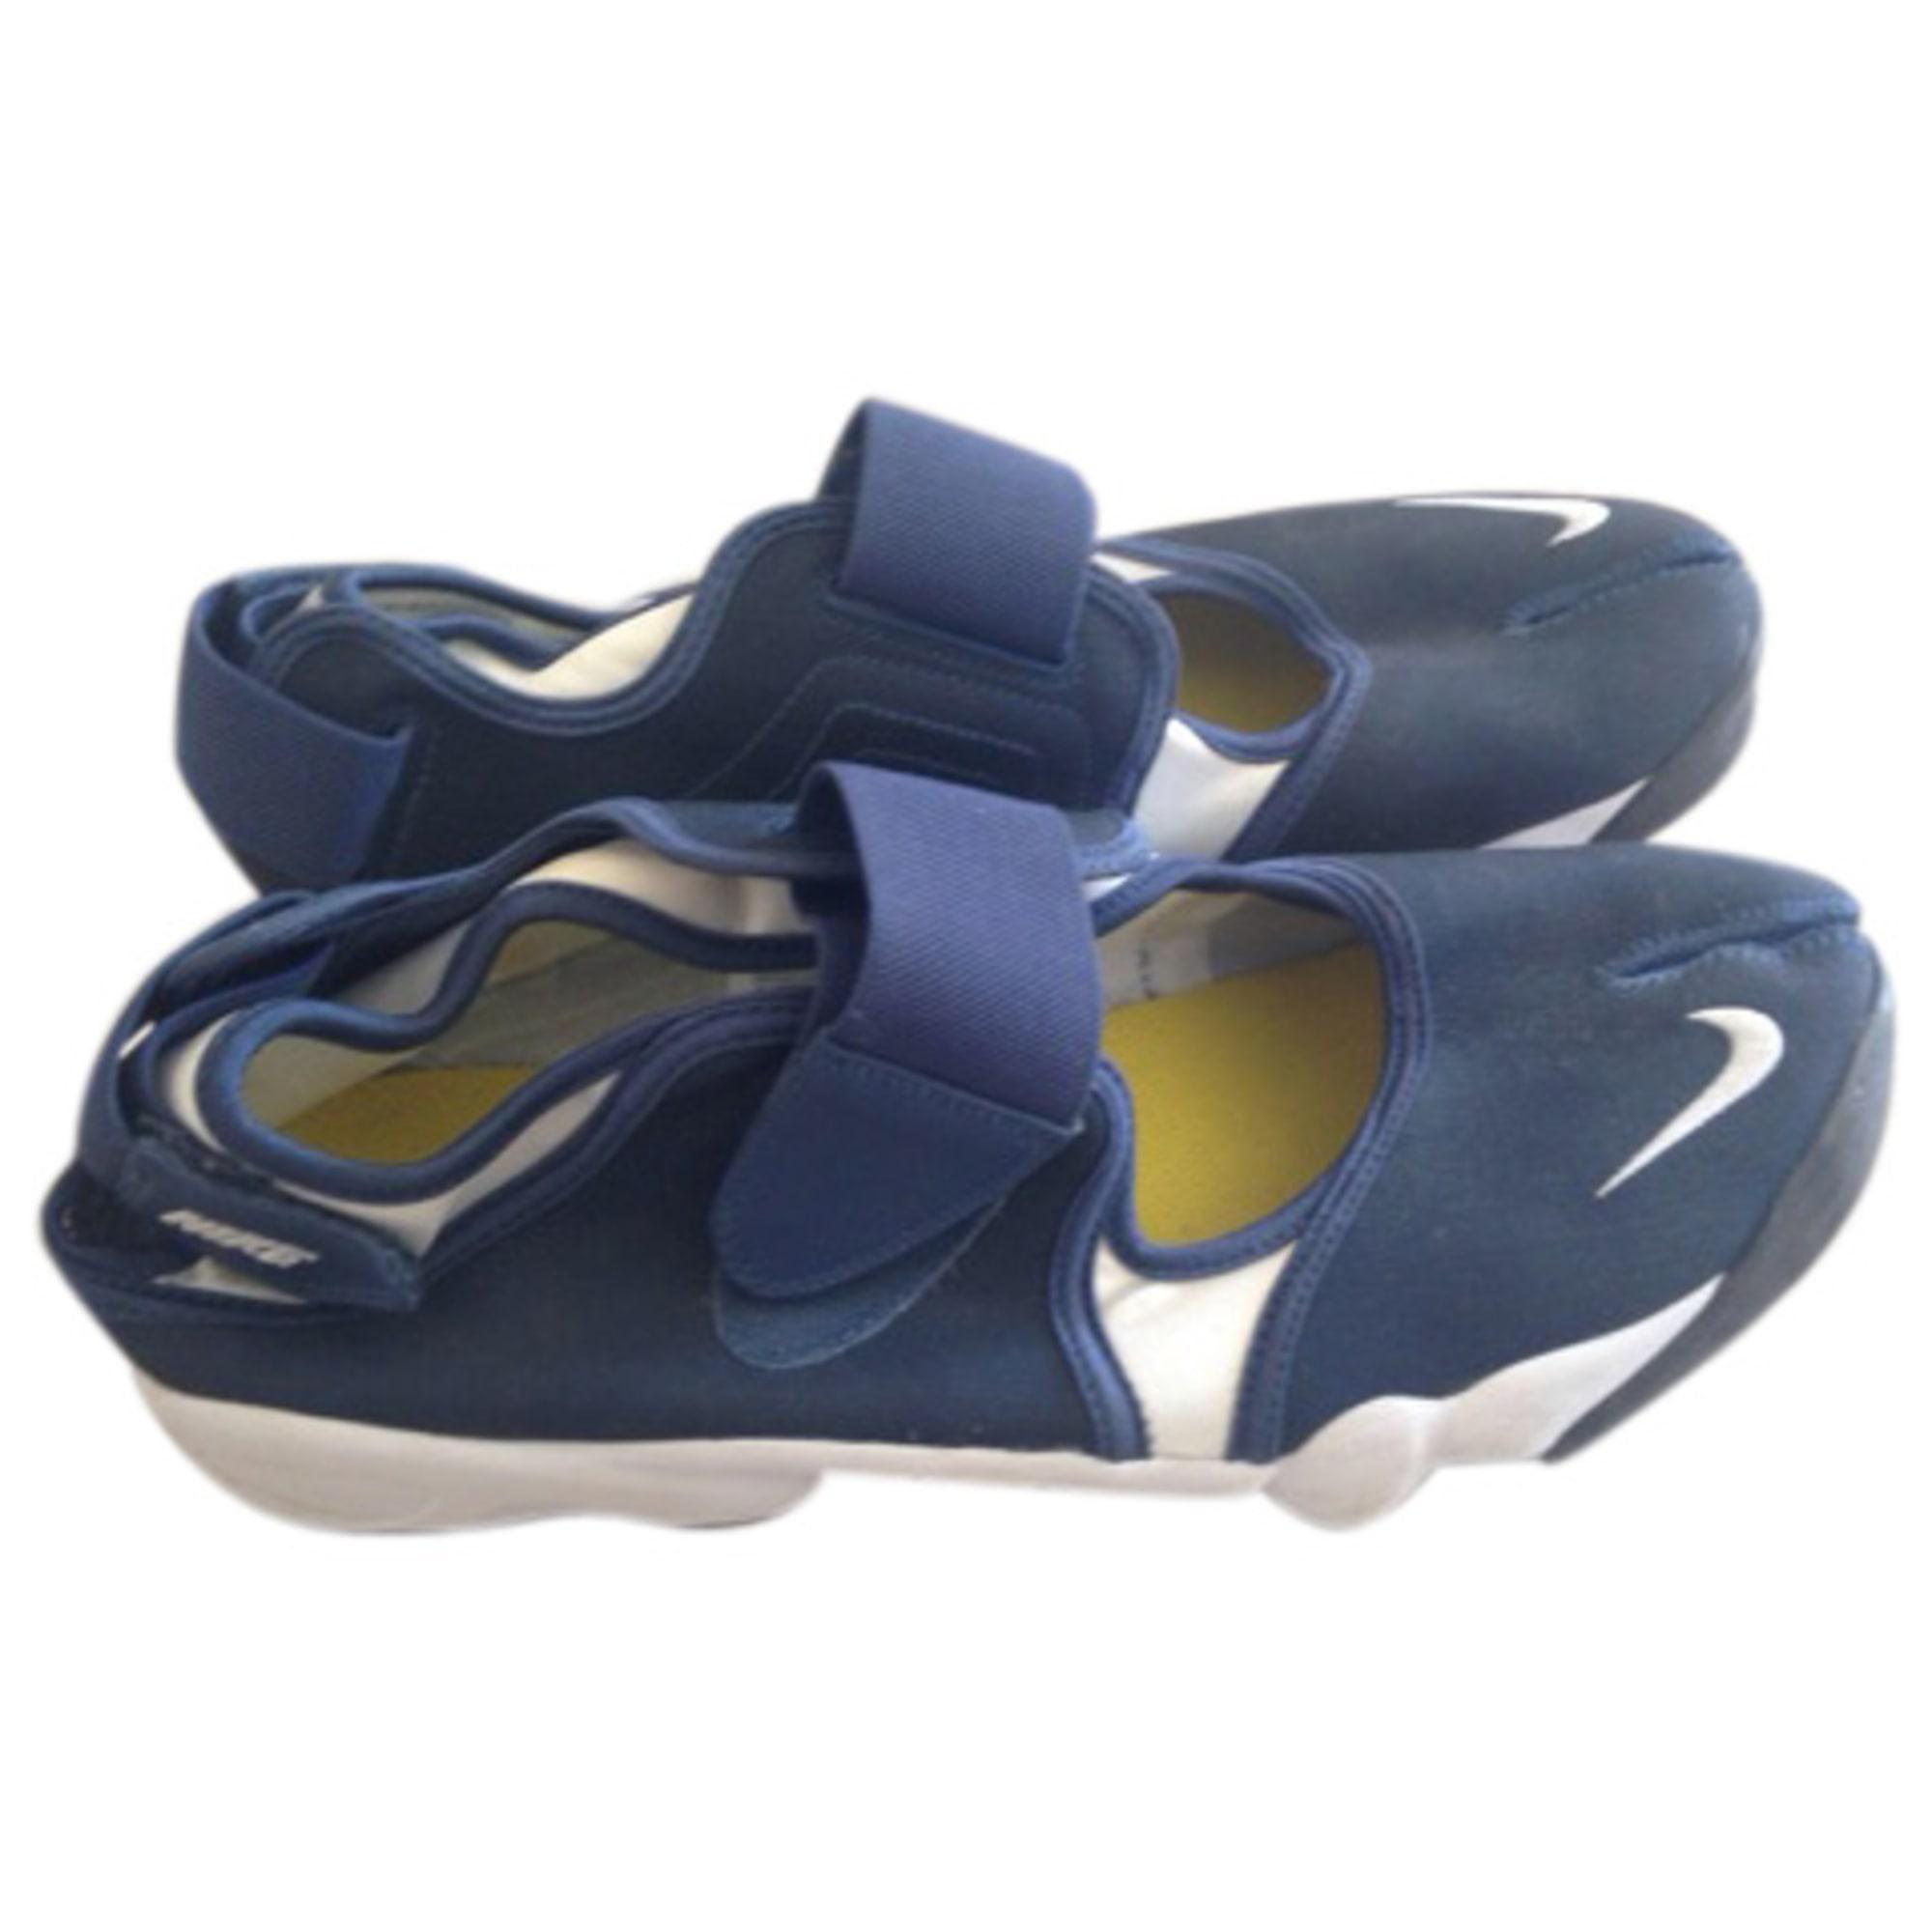 promo code d8870 e46ca Baskets NIKE Bleu, bleu marine, bleu turquoise